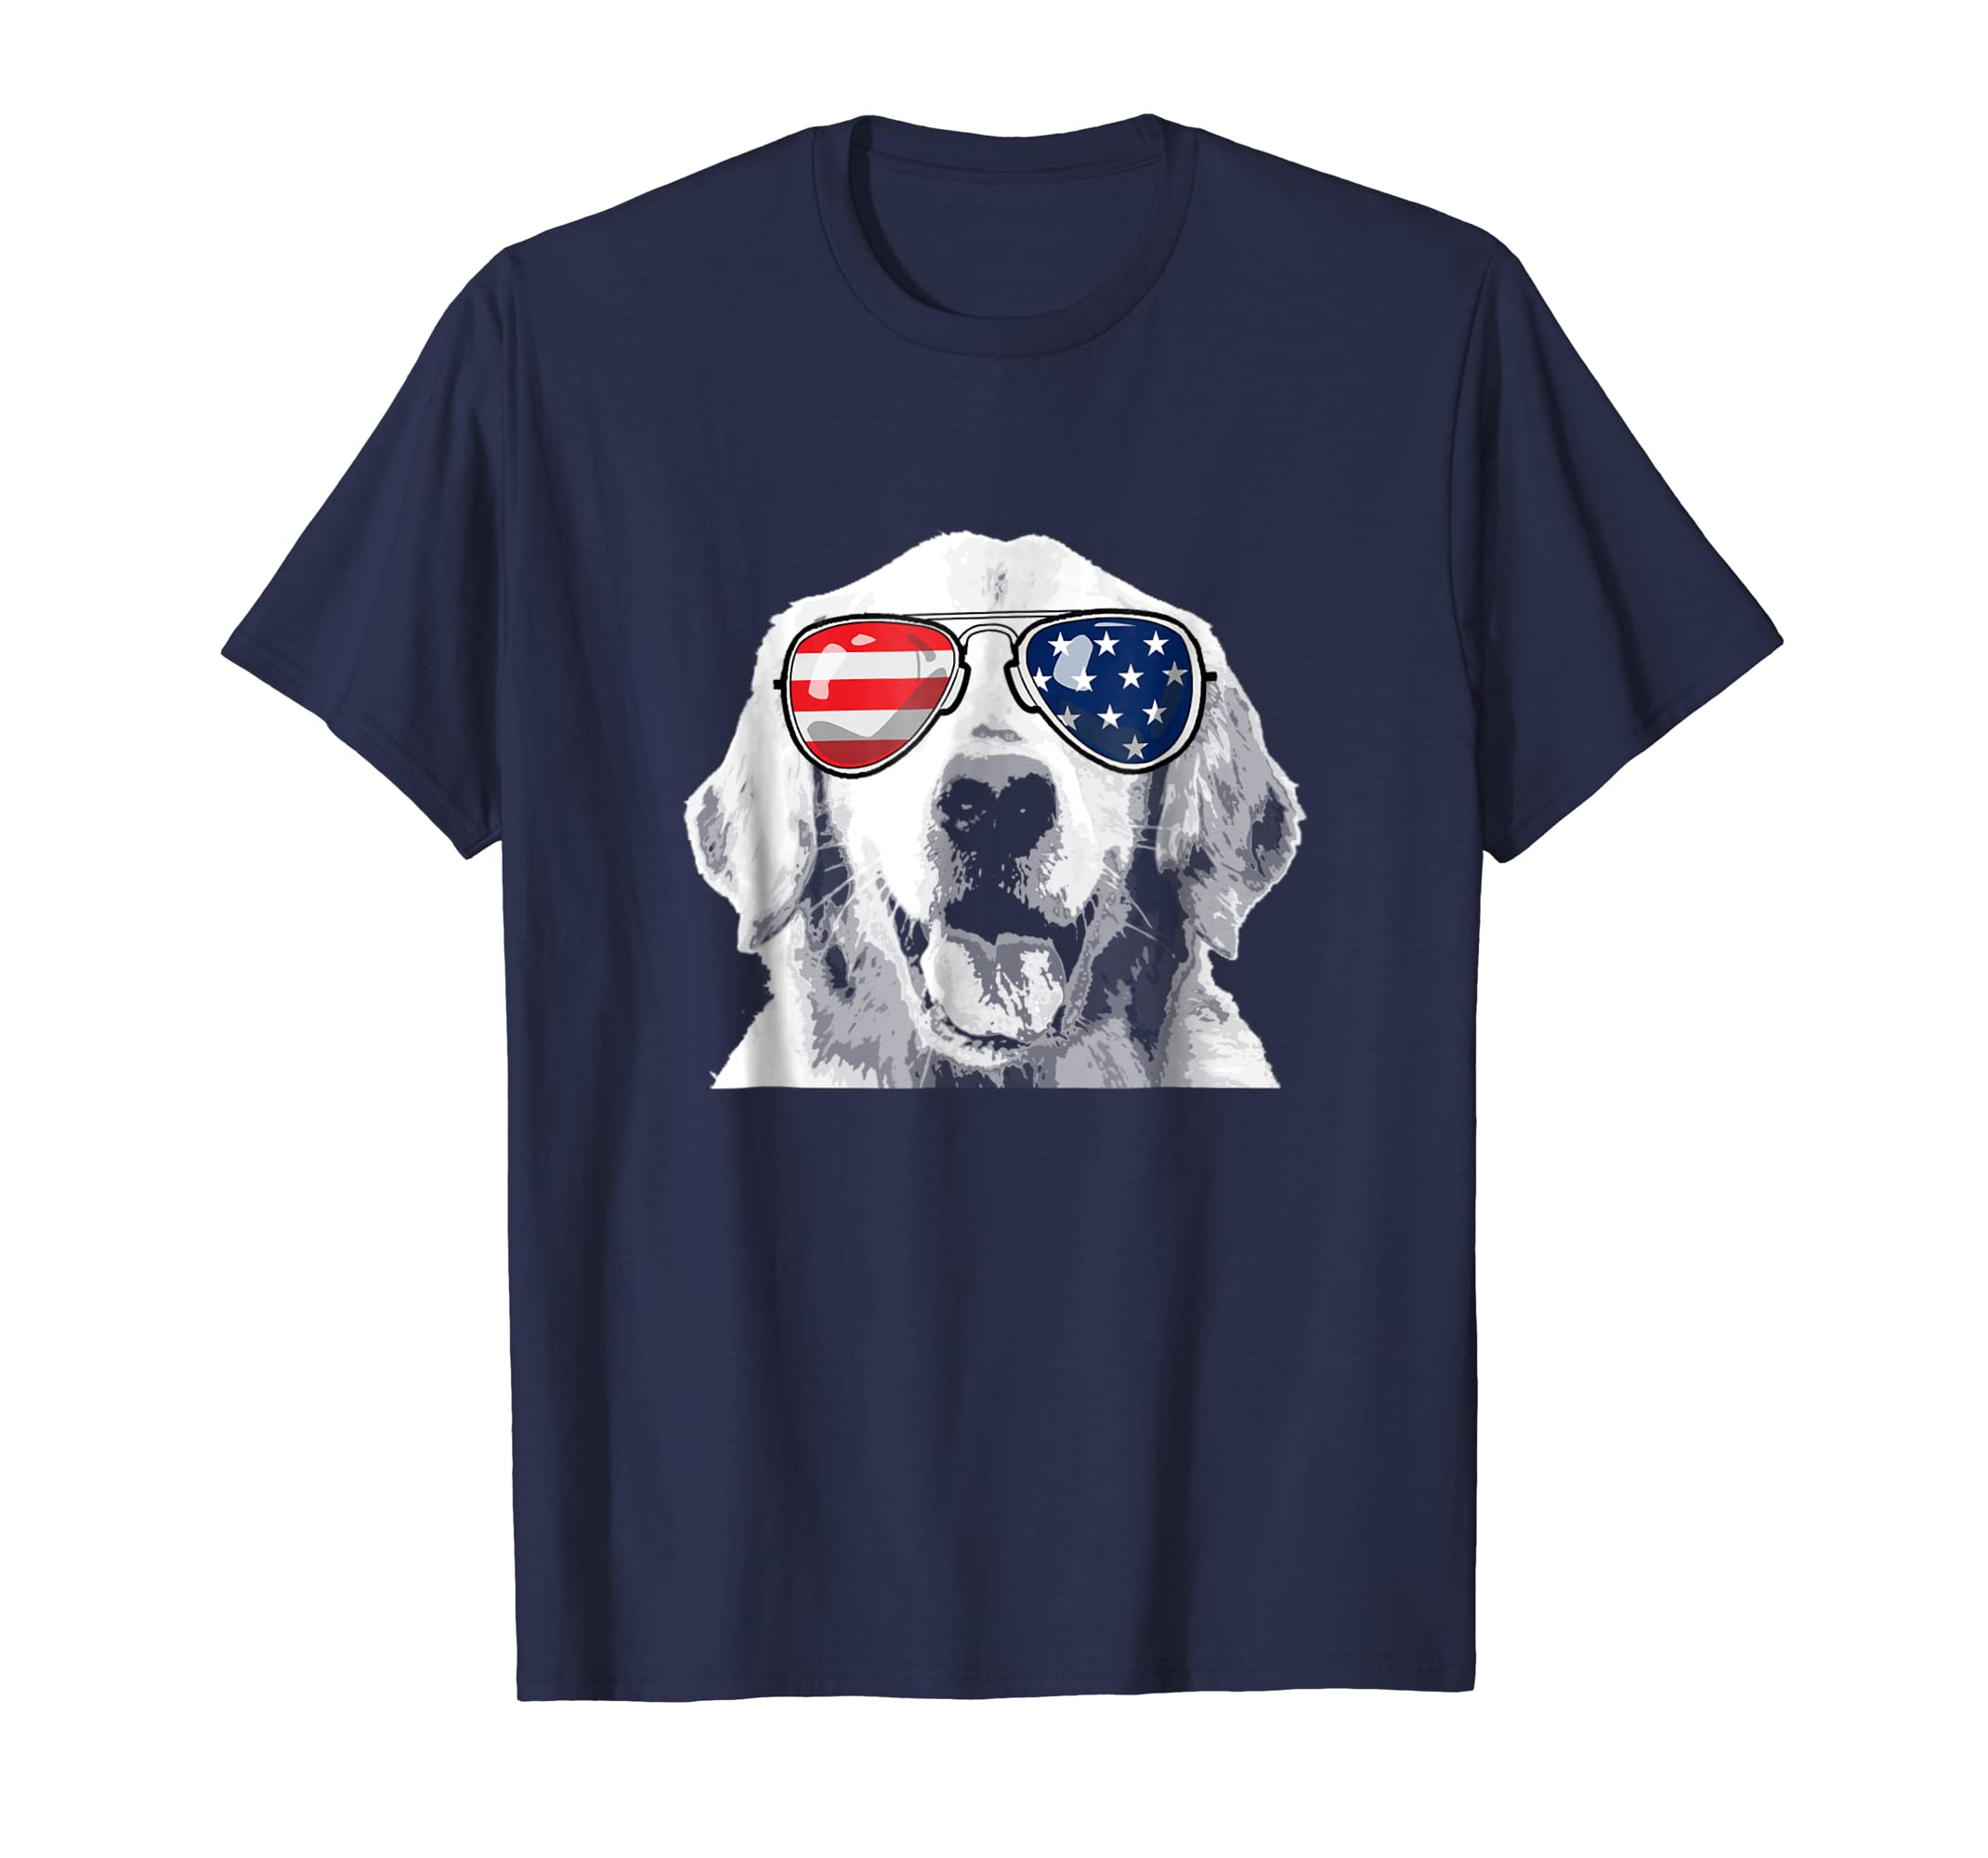 Patriotic Golden Retriever Dog T-Shirt 4th of july